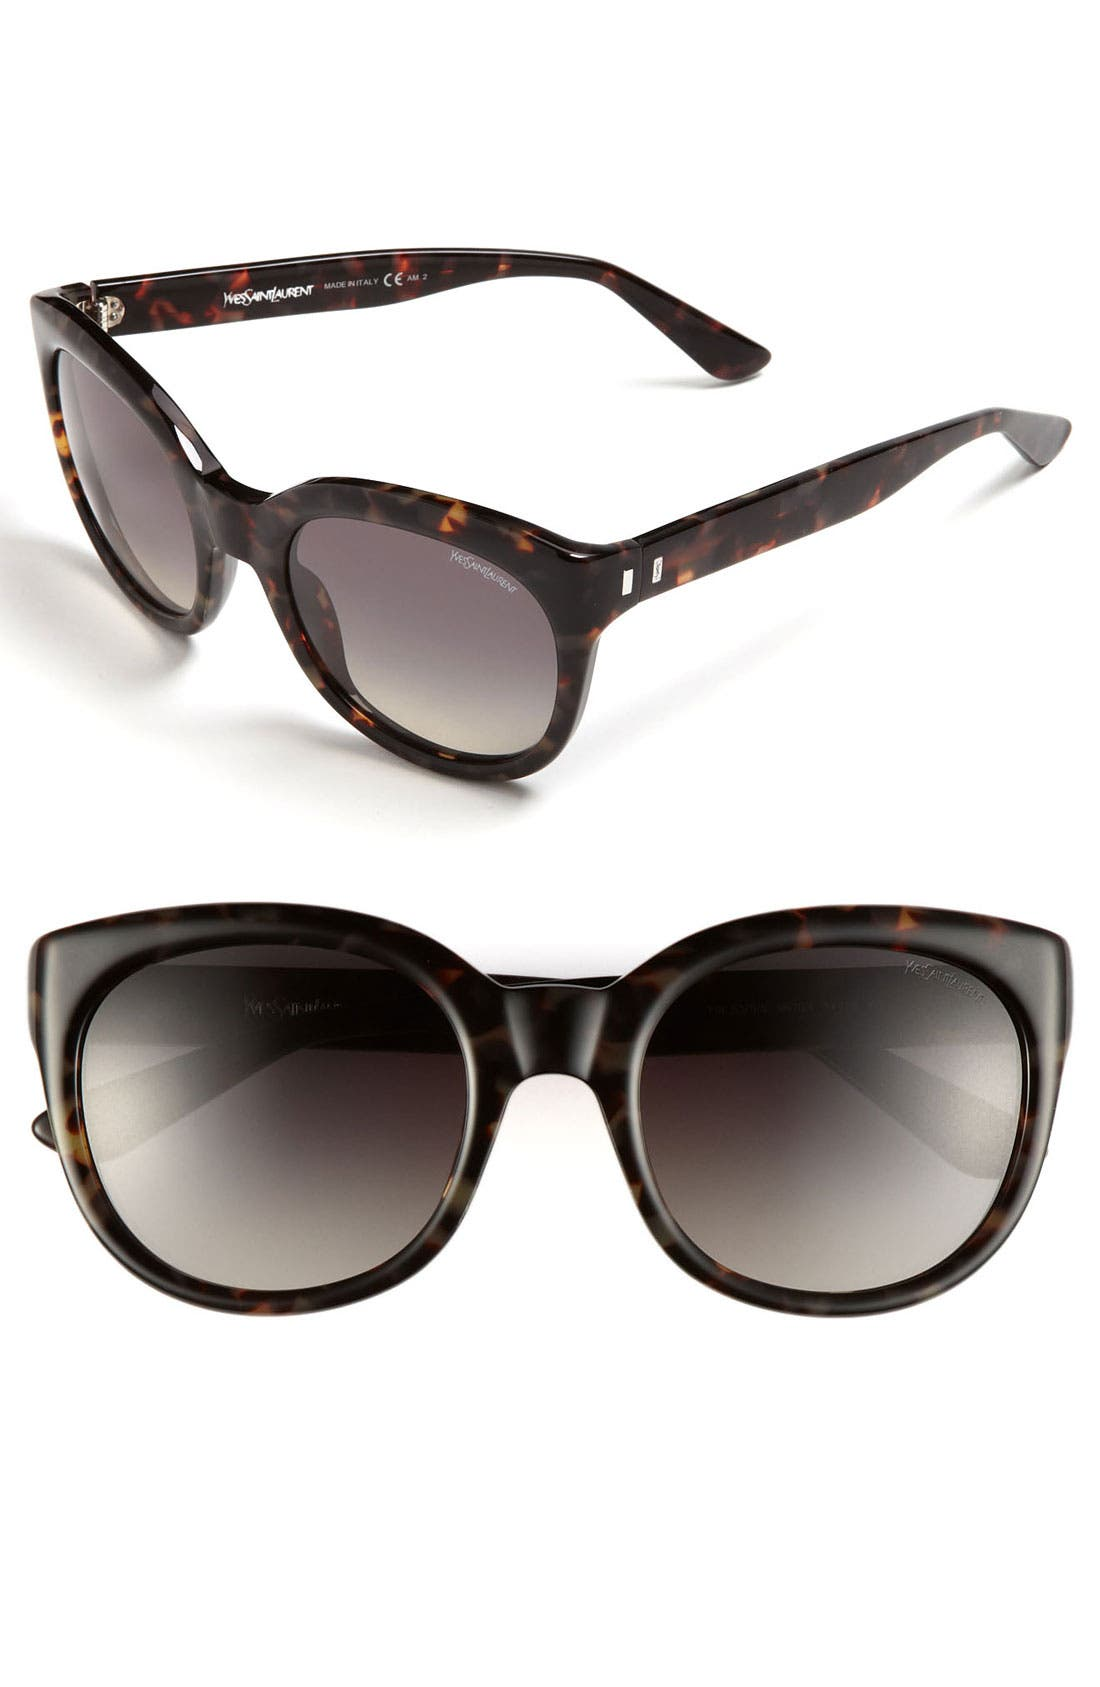 Saint Laurent Cat's Eye Sunglasses,                         Main,                         color, Havana Olive